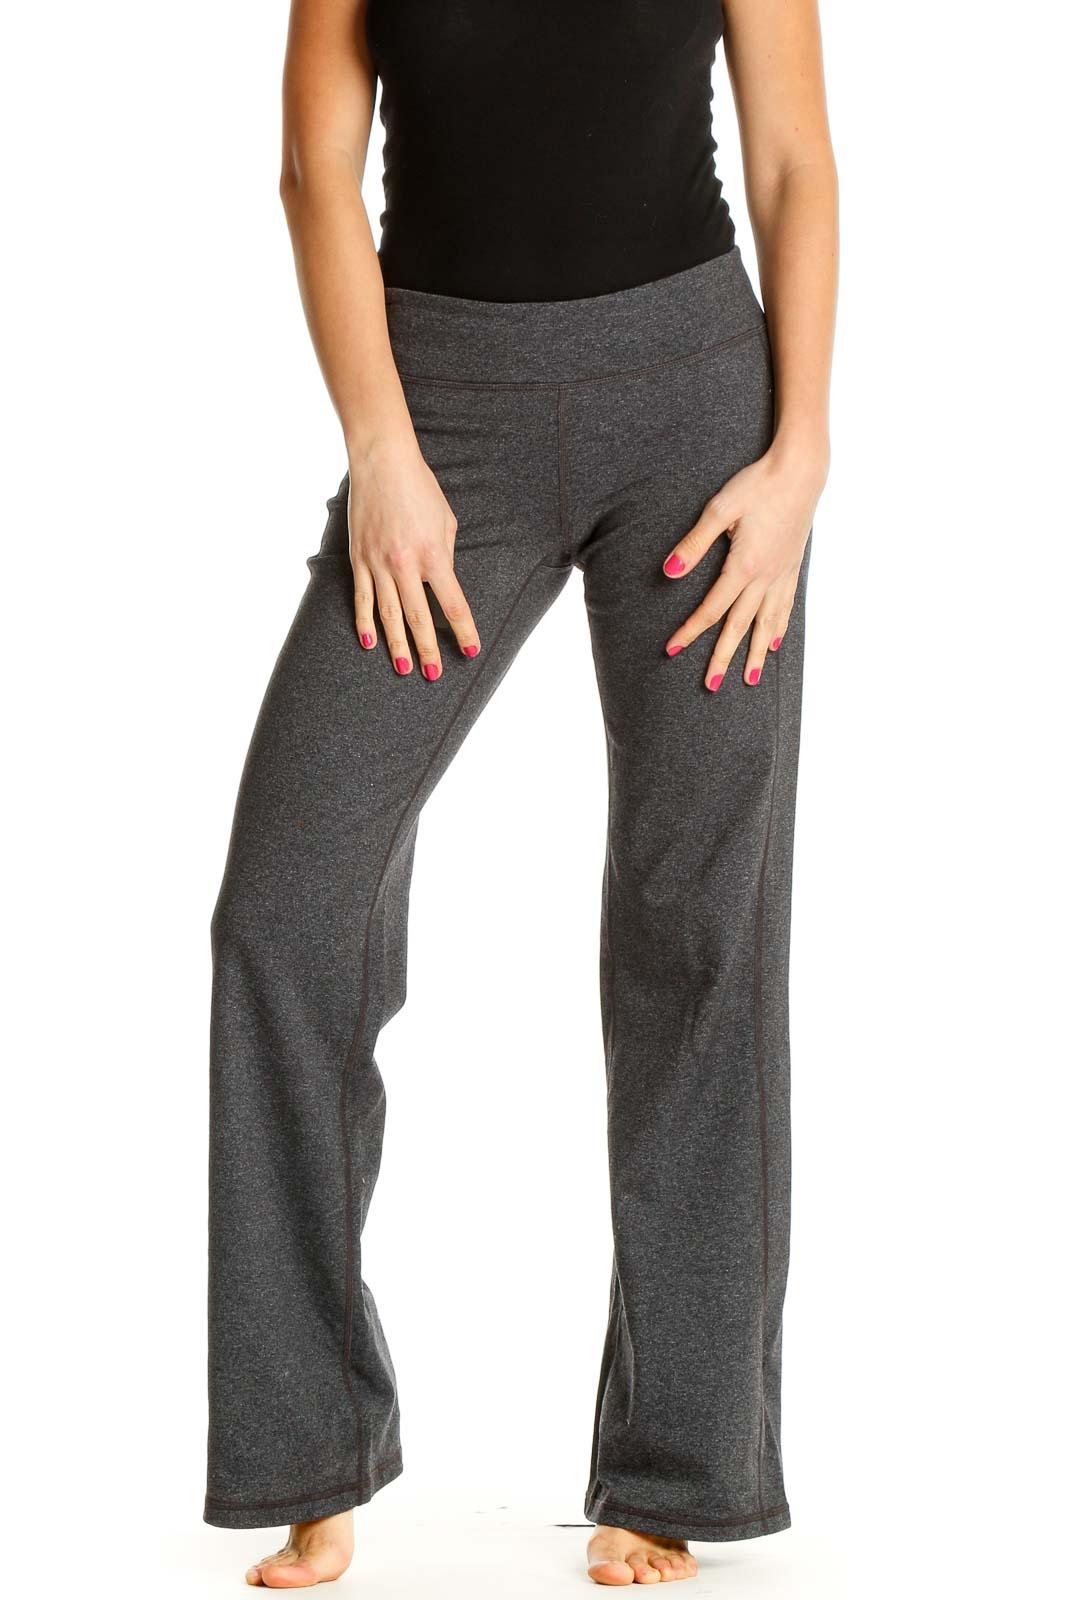 Beige Solid All Day Wear Leggings Front